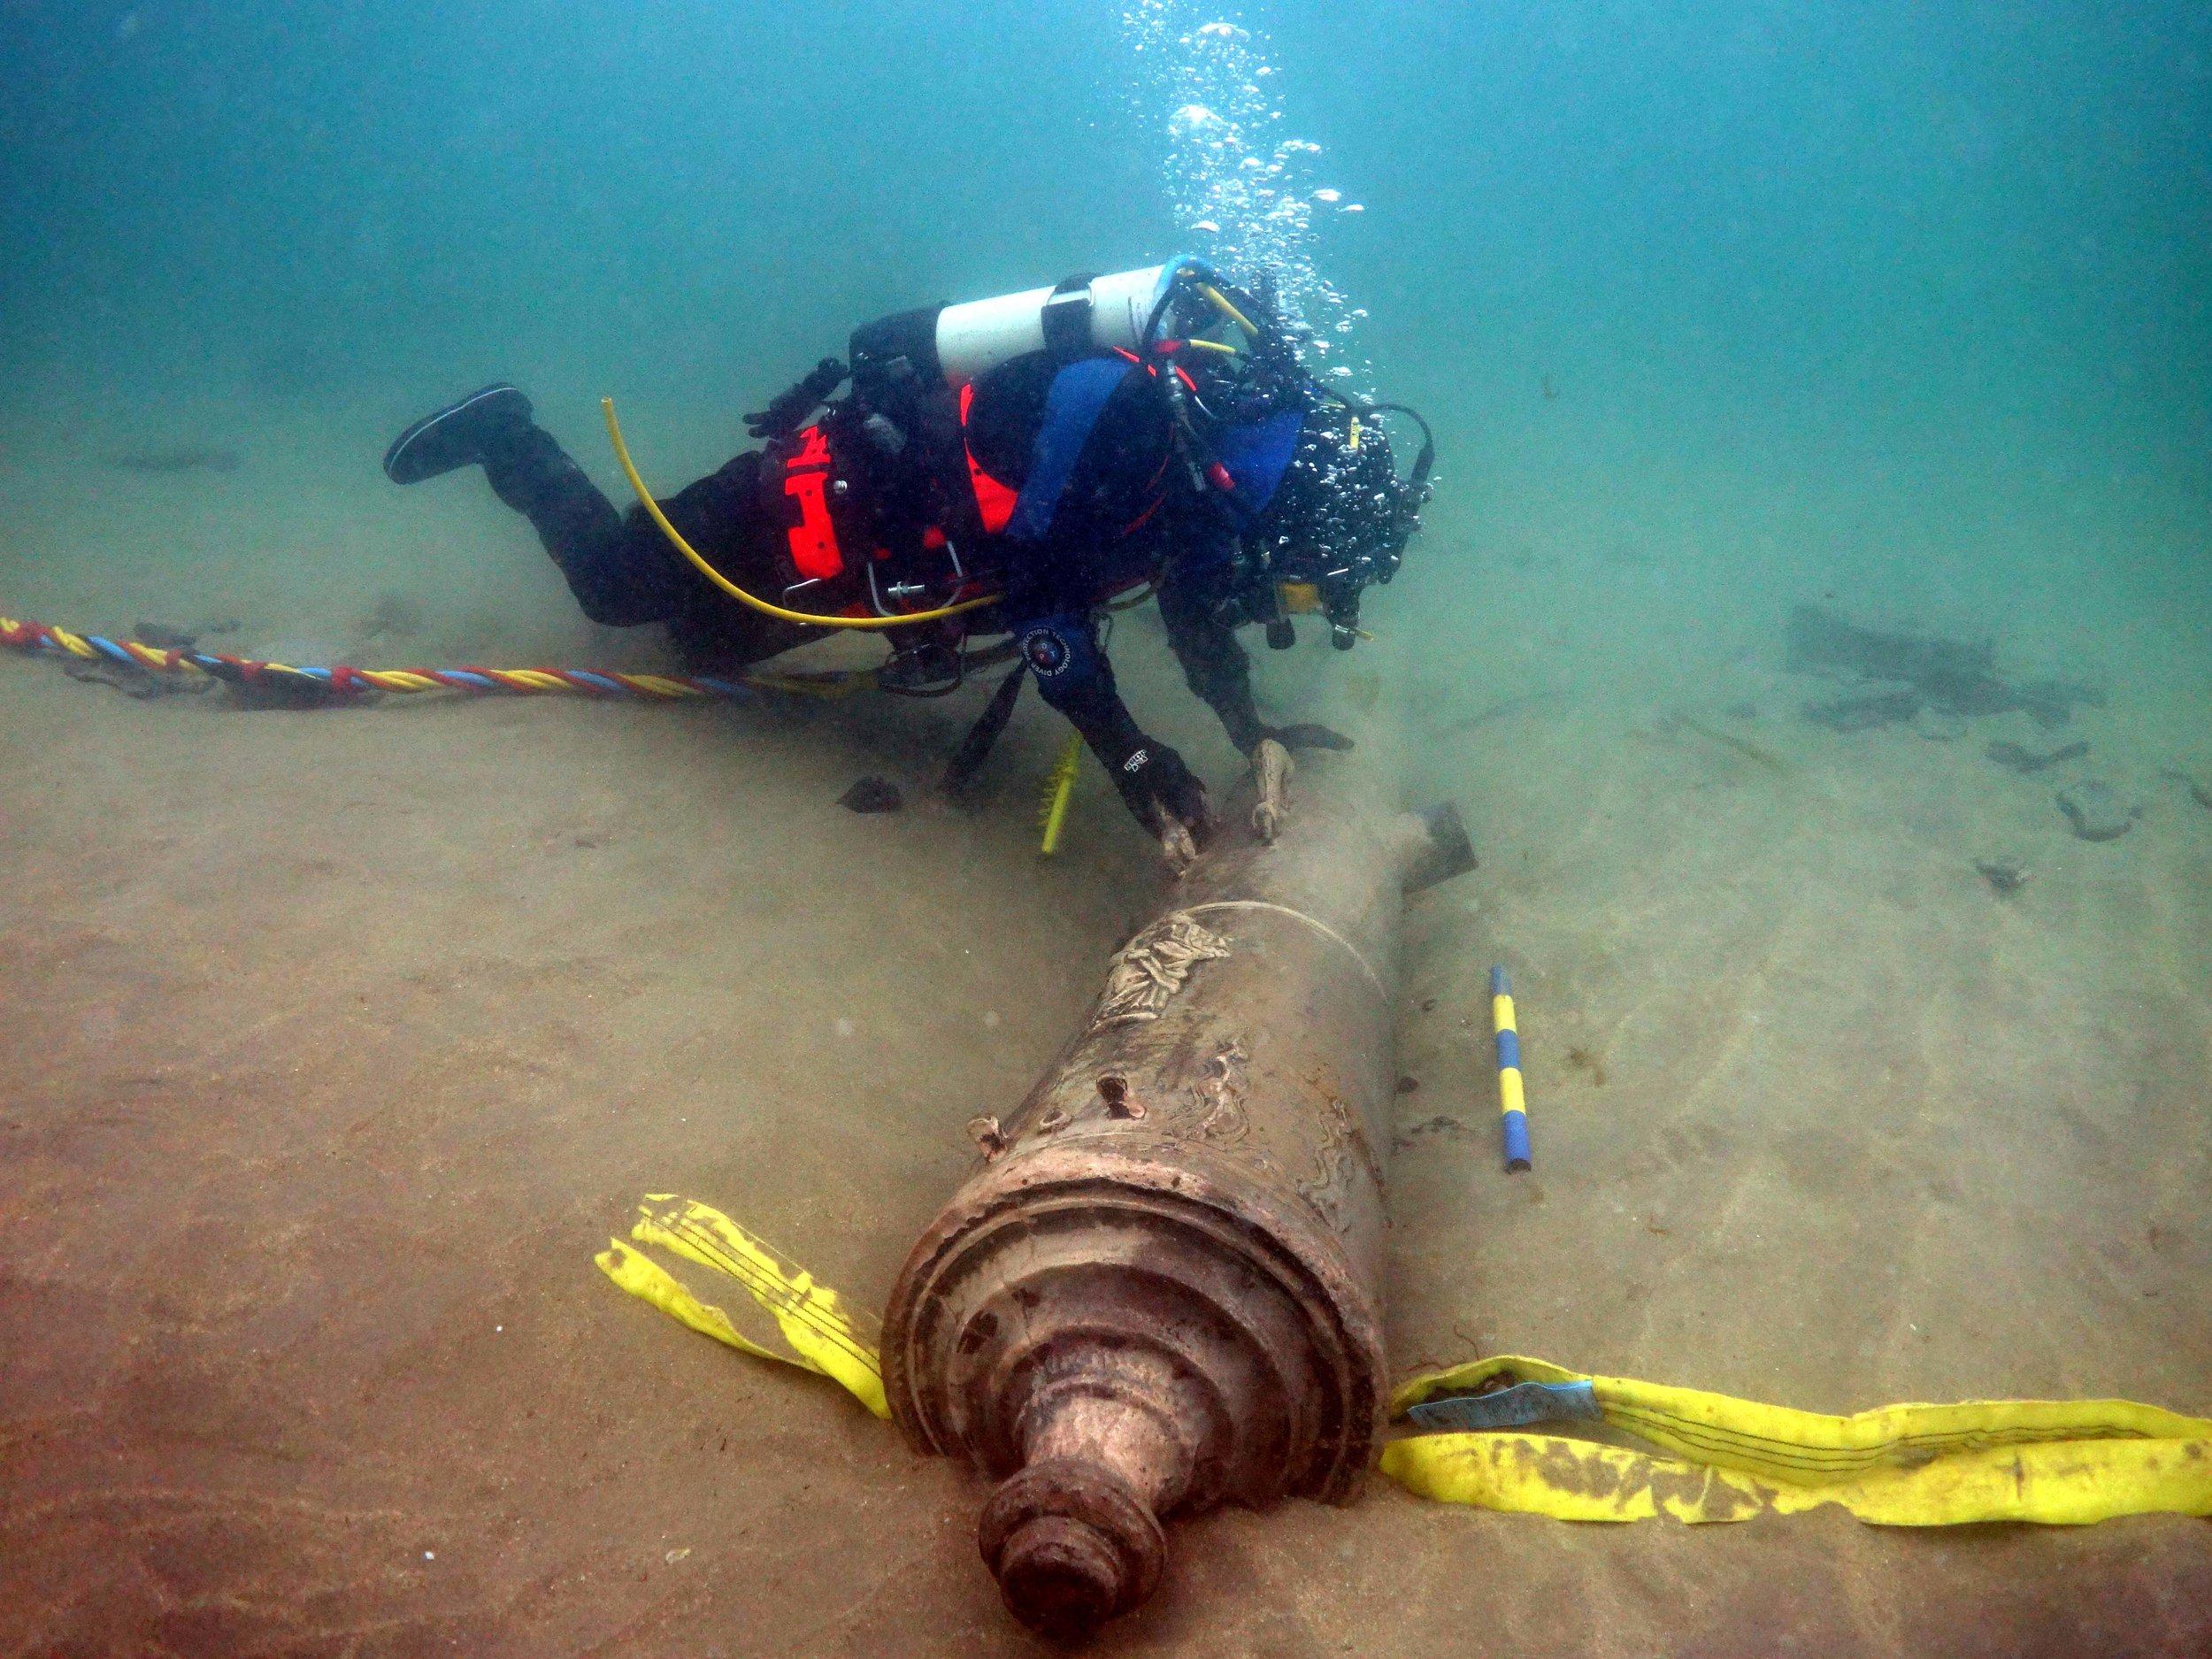 Spanish Armada cannon recovery from  La Juliana  at Streedagh Beach in 2015 © UAU